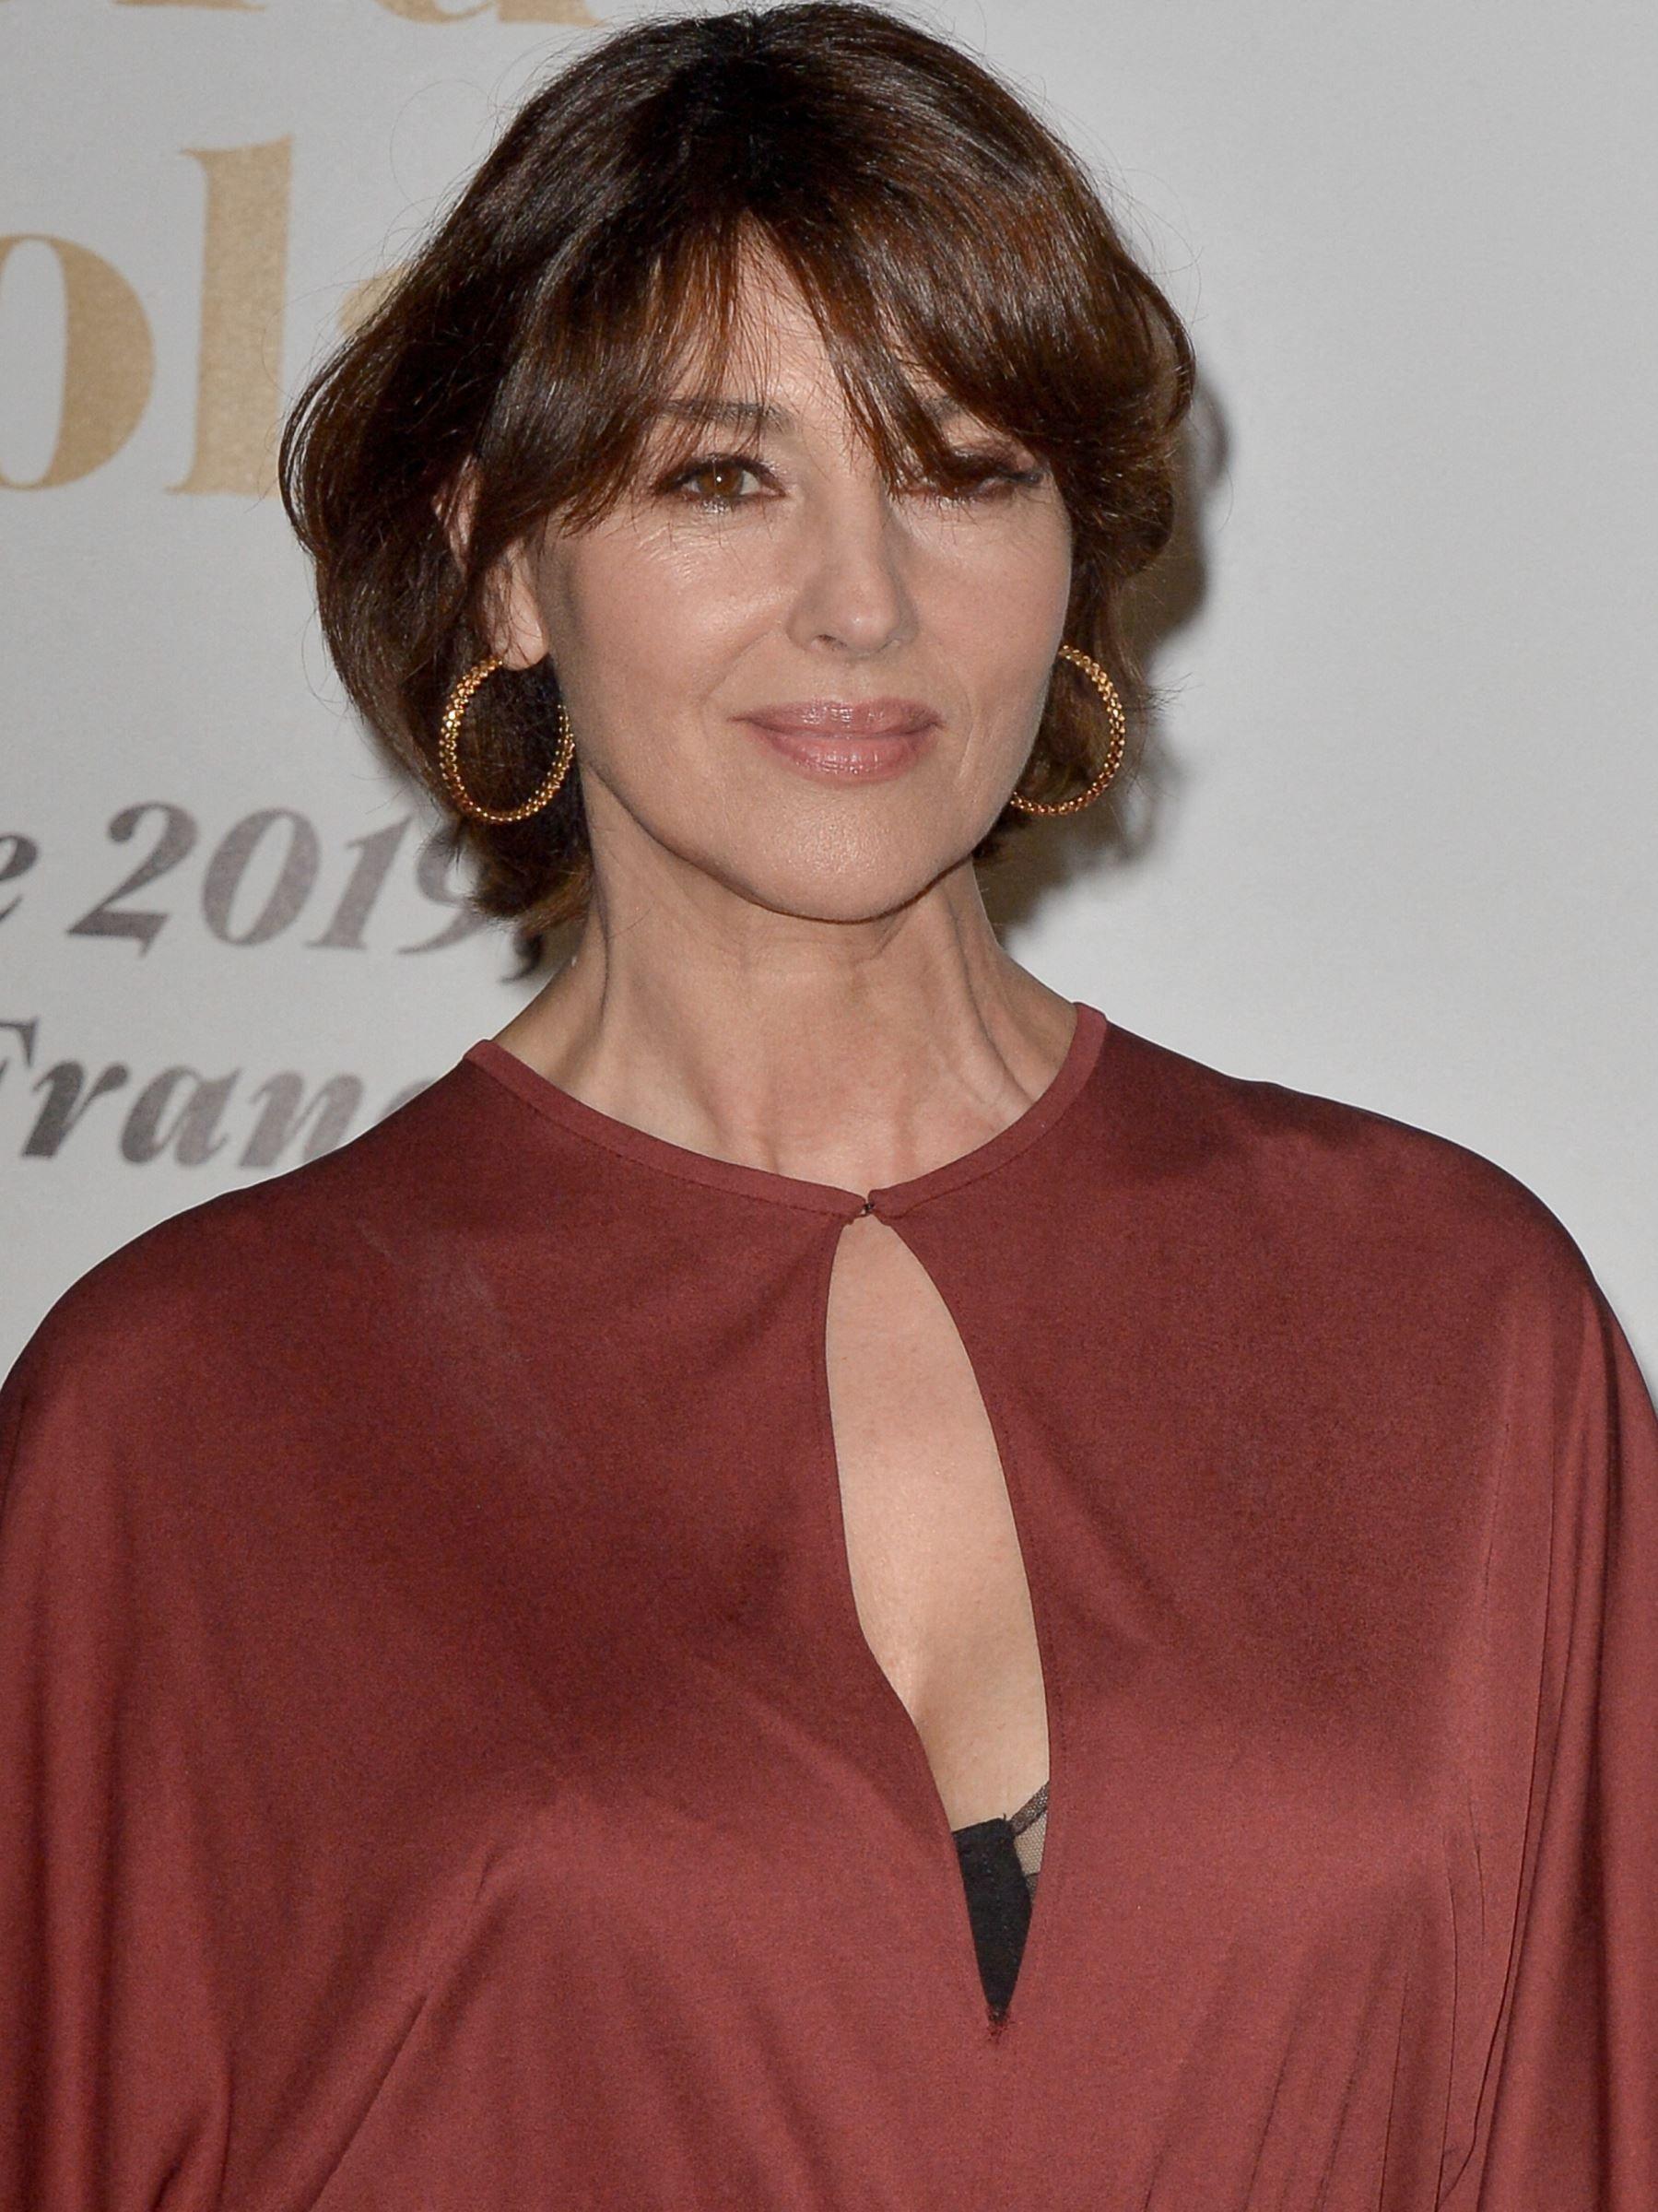 Telle Mere Telle Fille Monica Bellucci Tendances Beaute Actrice Italienne